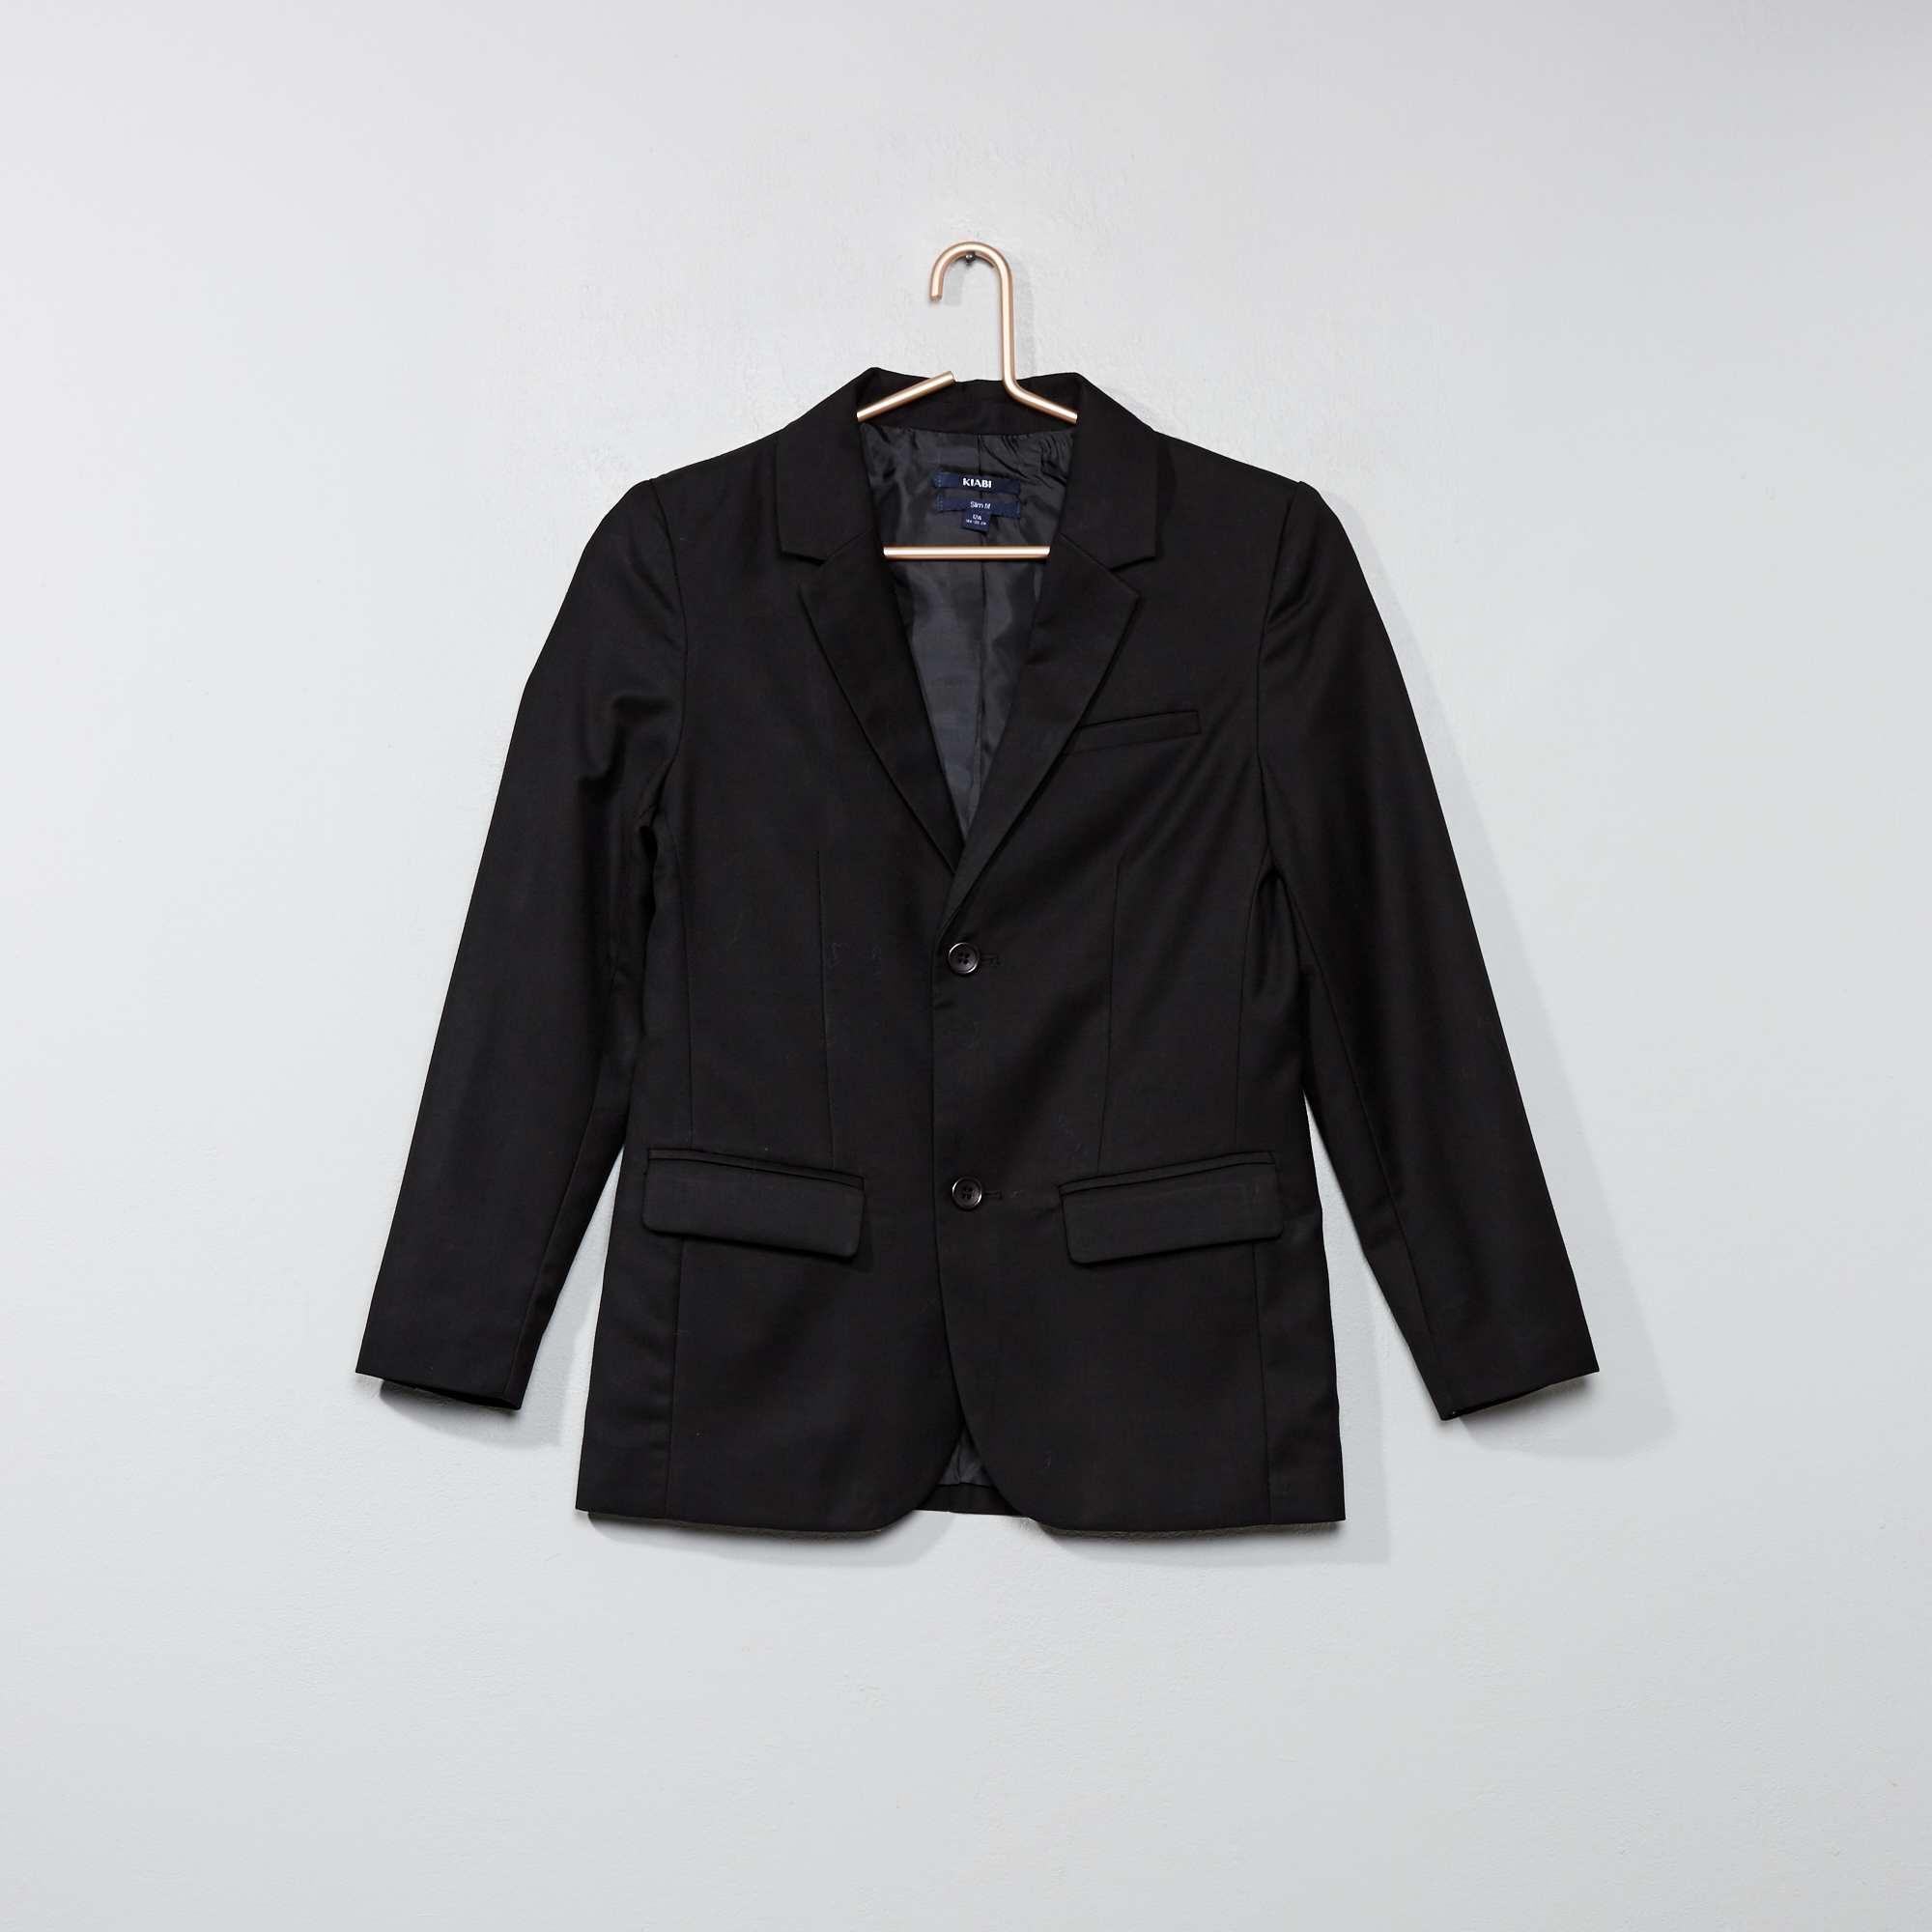 veste de costume gar on adolescent noir kiabi 25 00. Black Bedroom Furniture Sets. Home Design Ideas